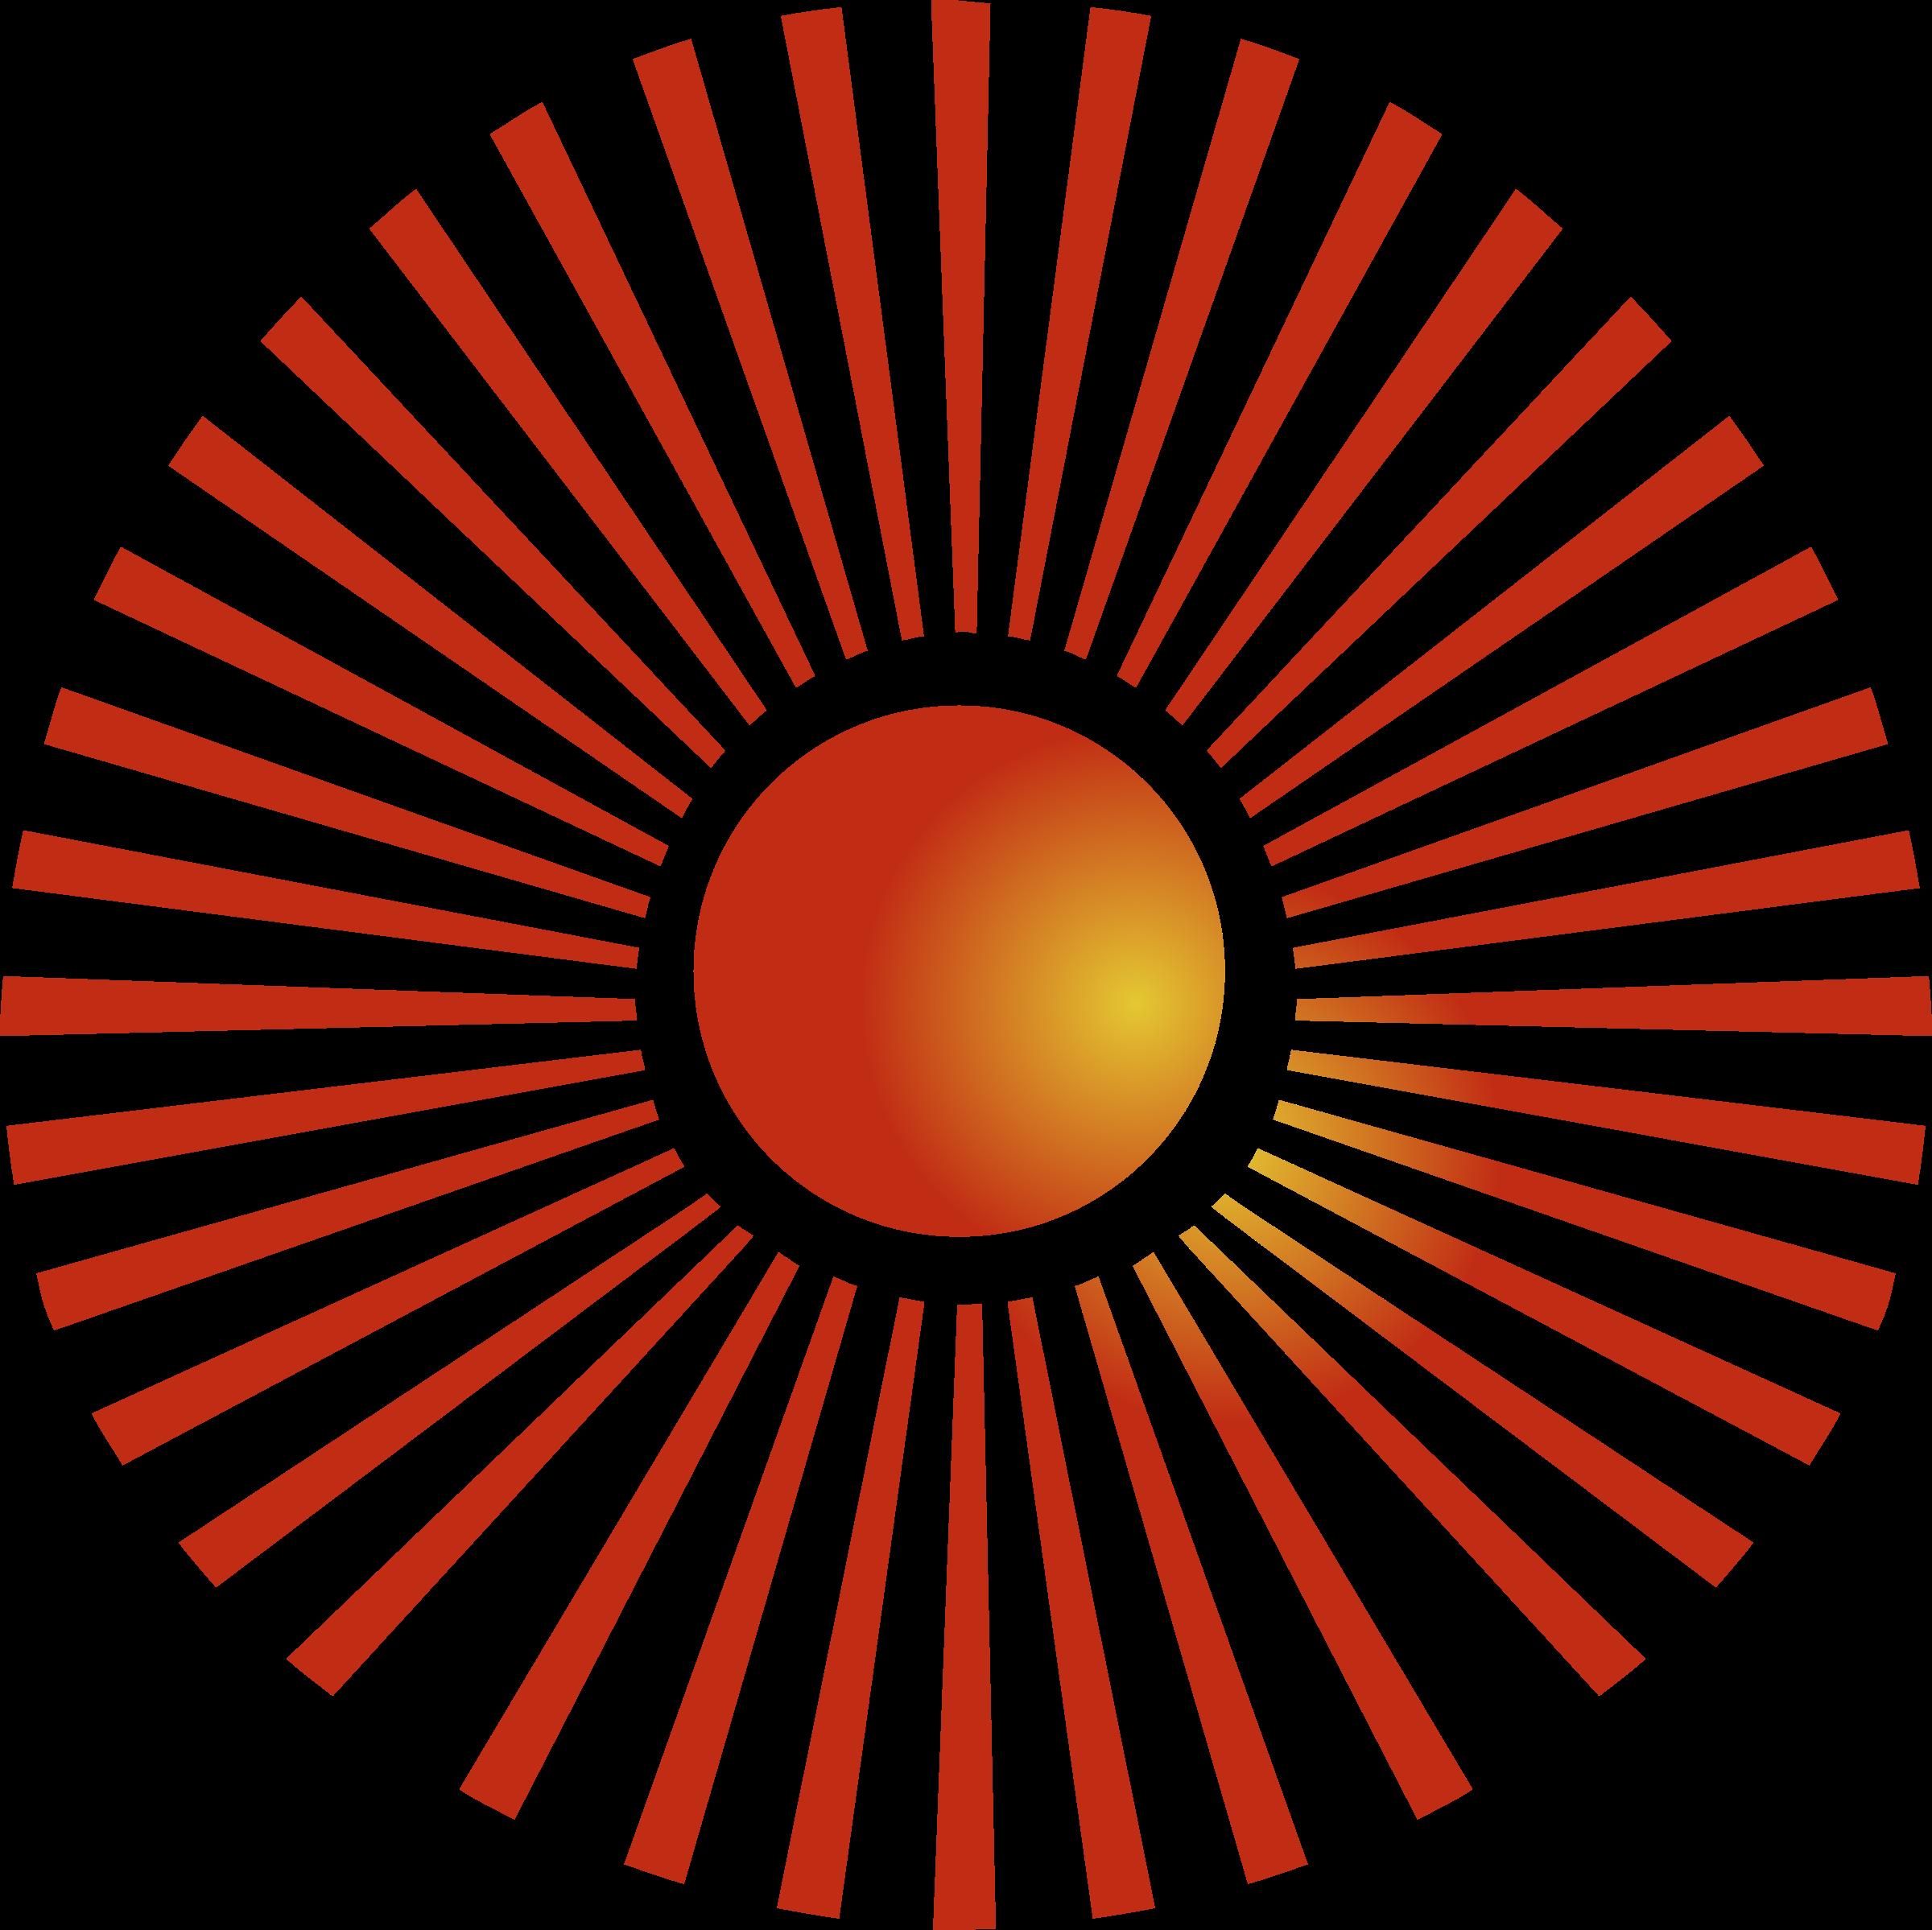 Clipart - Blazing sun 4 jpg transparent library